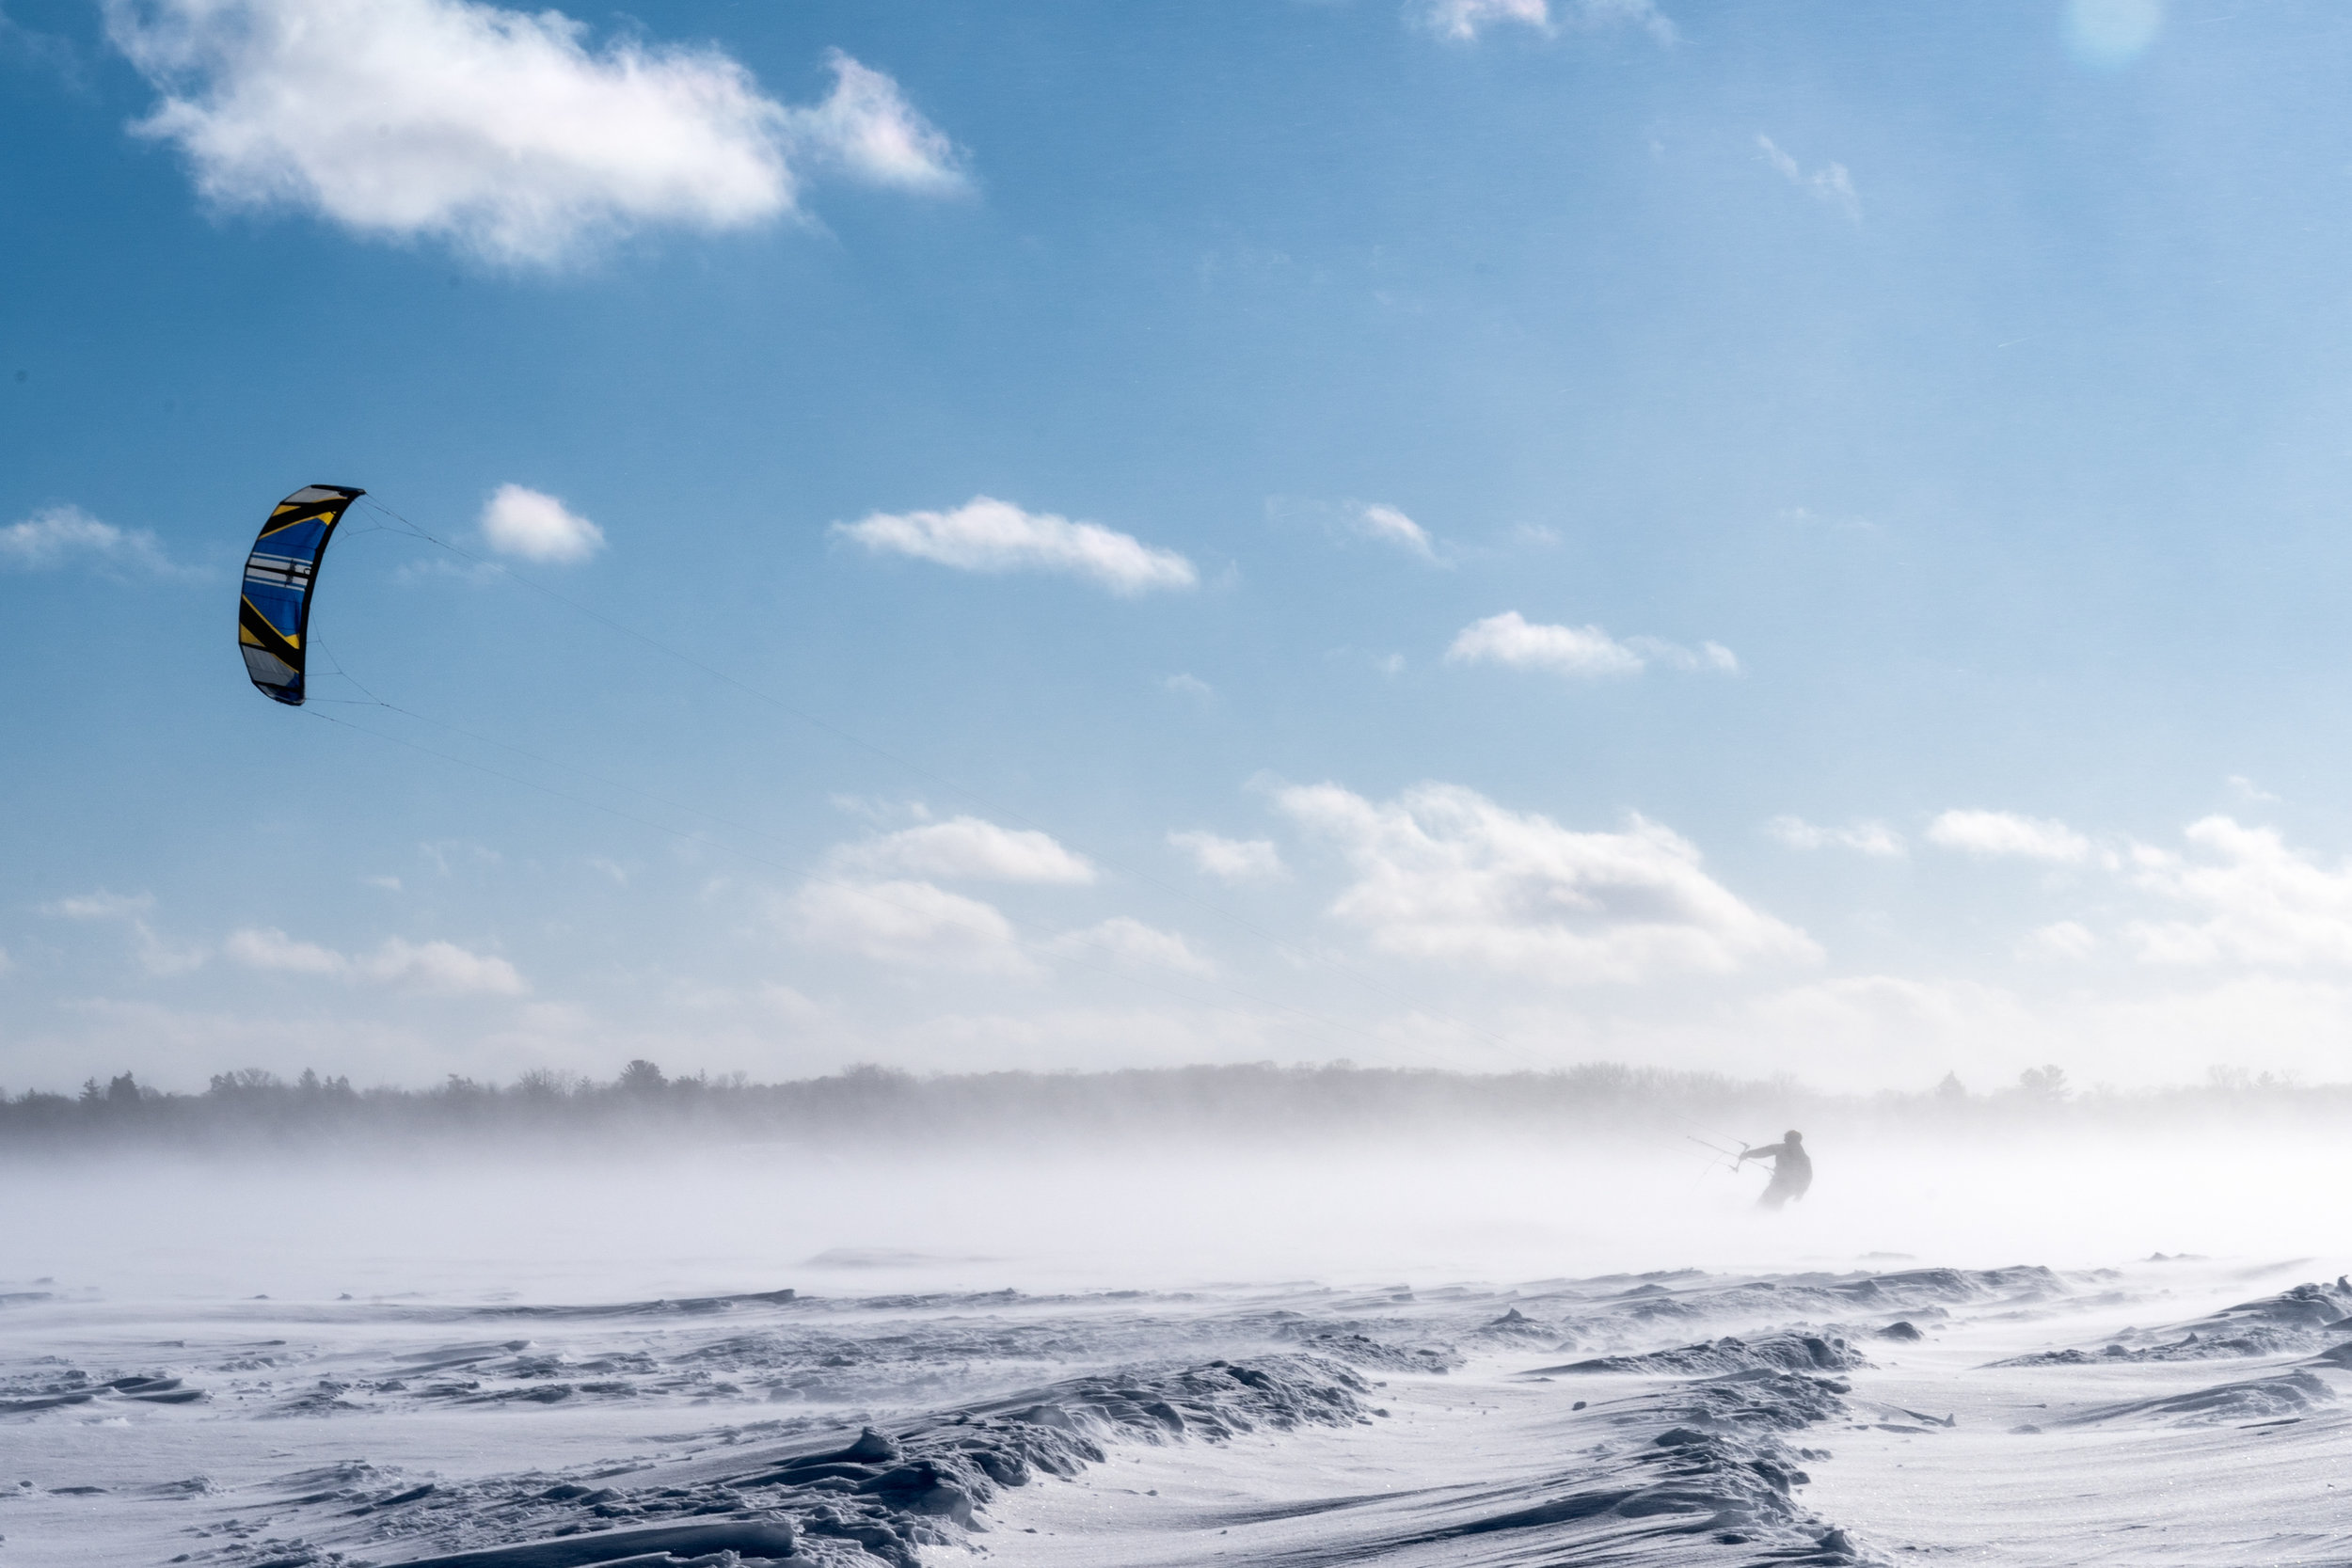 Snowkiting in Wayzata, Minnesota